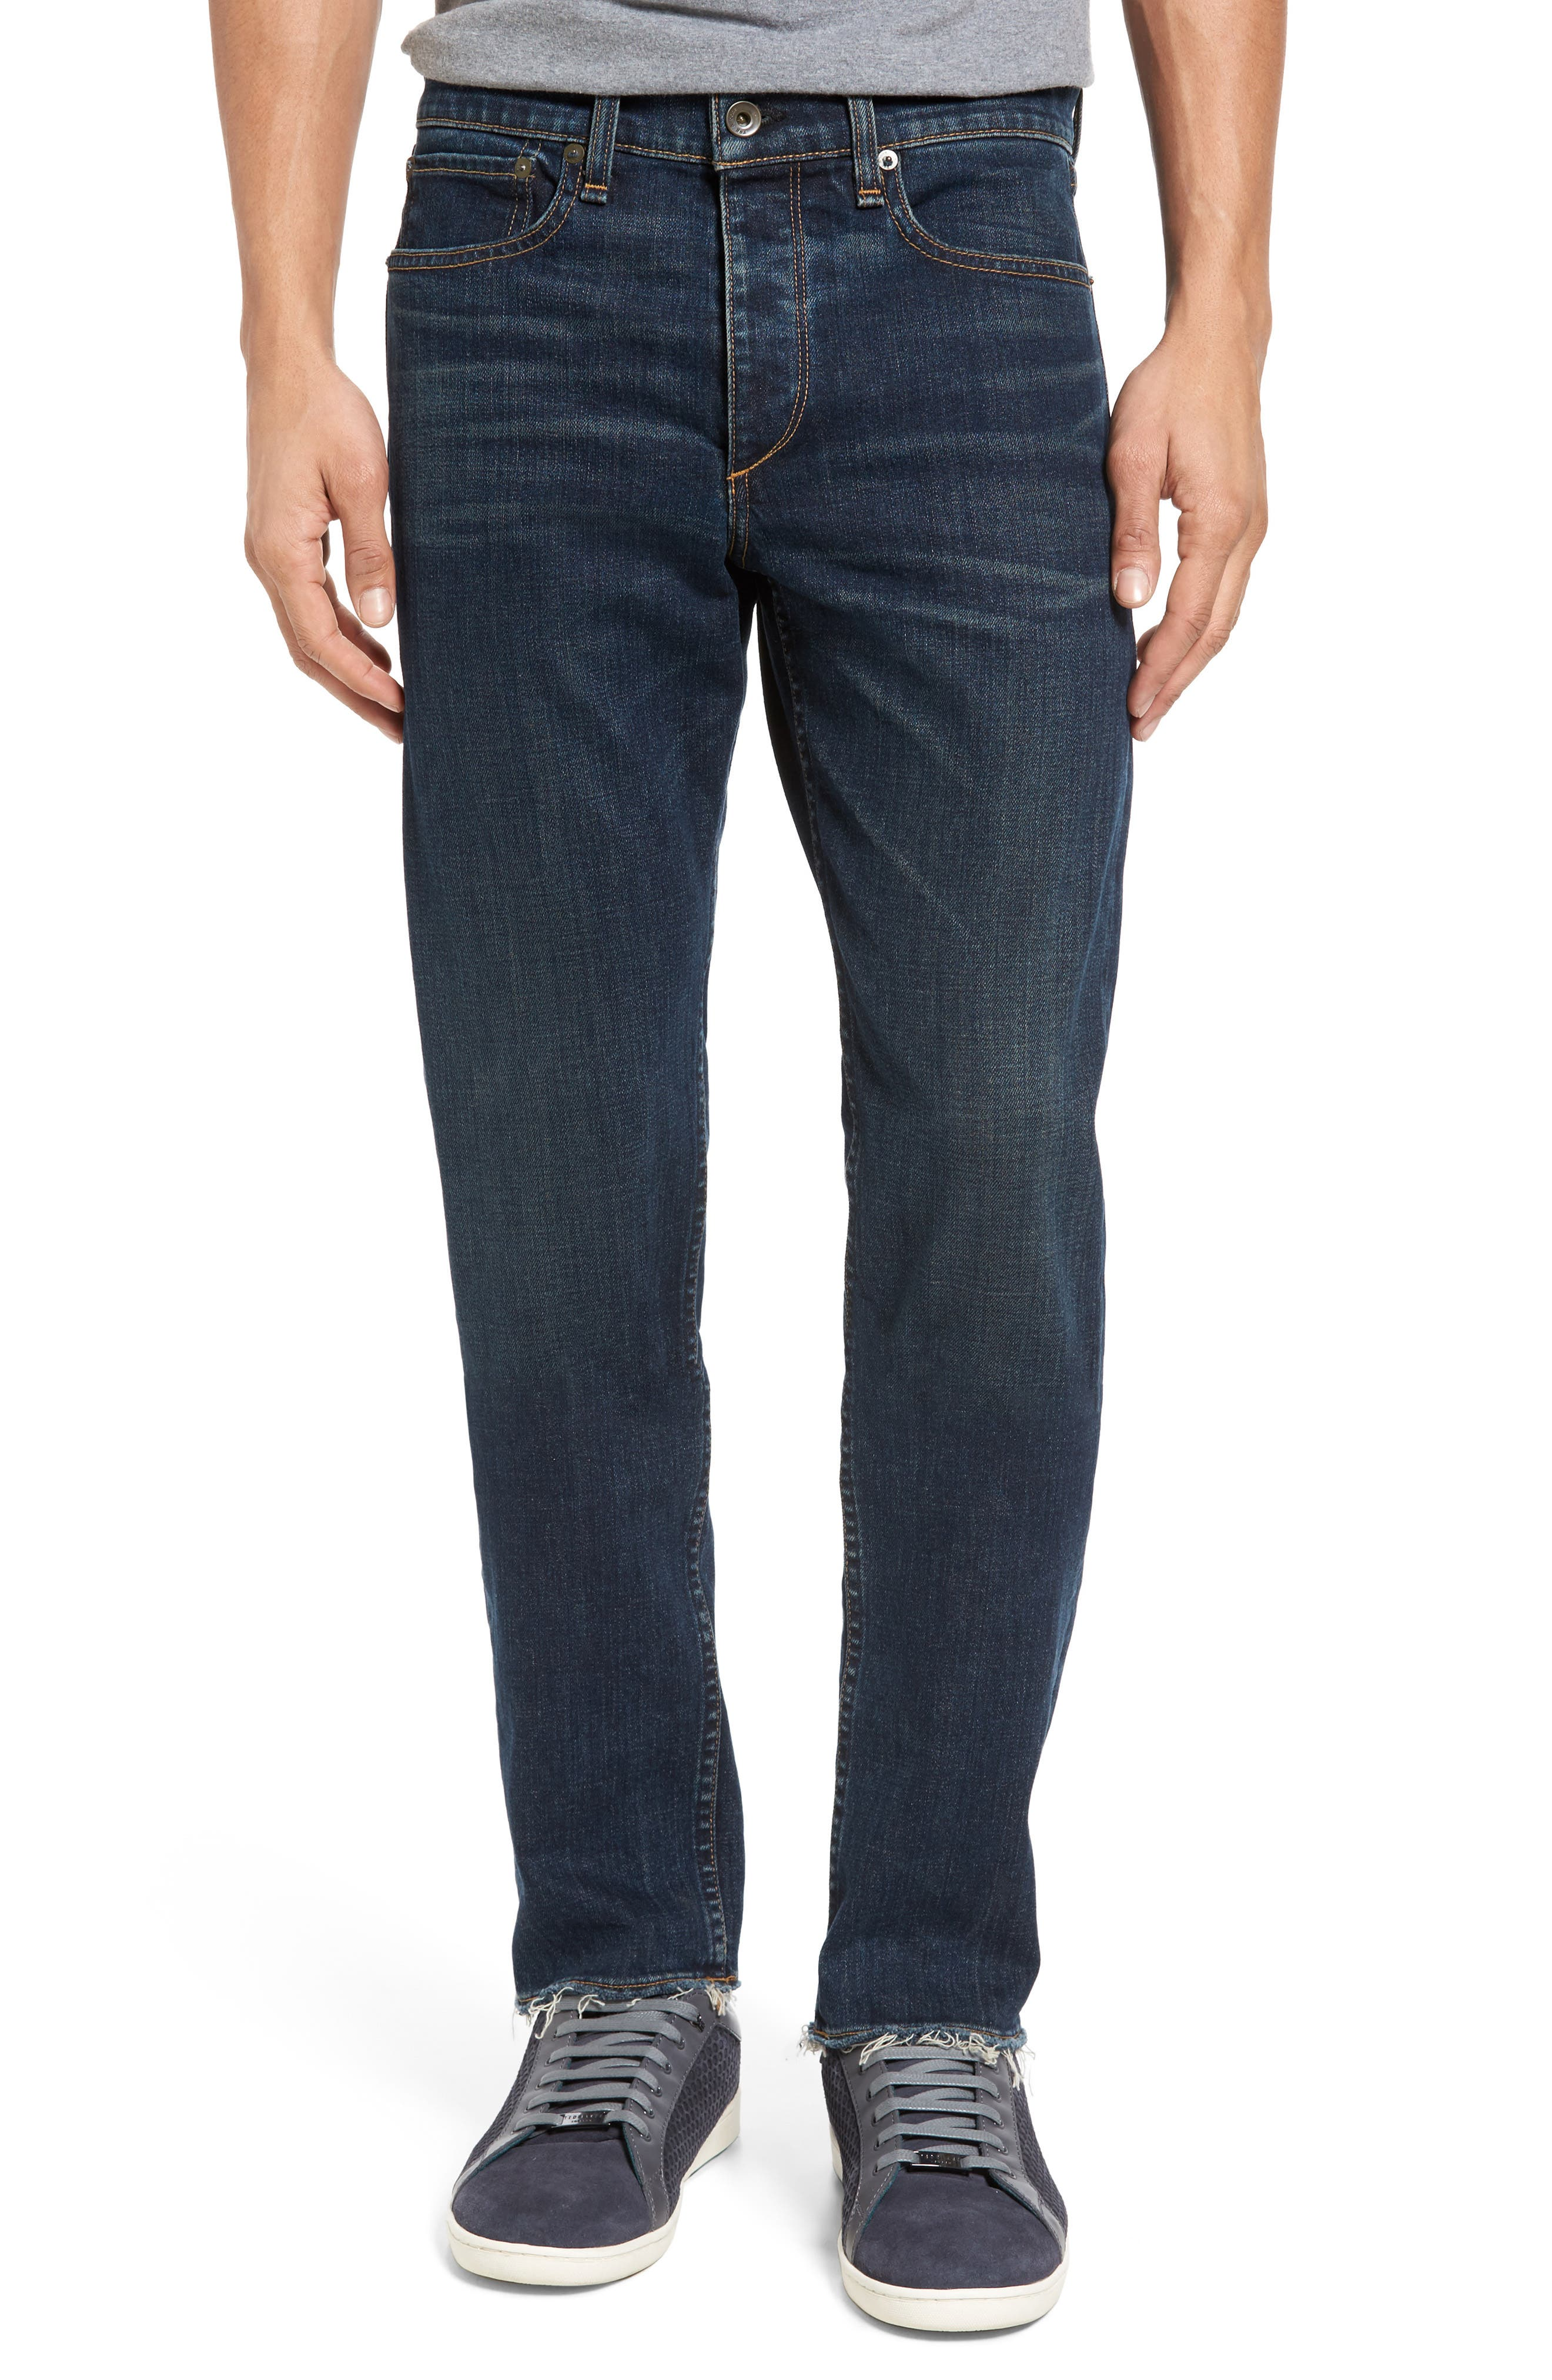 Alternate Image 1 Selected - rag & bone Fit 2 Slim Fit Jeans (Plattsburg)